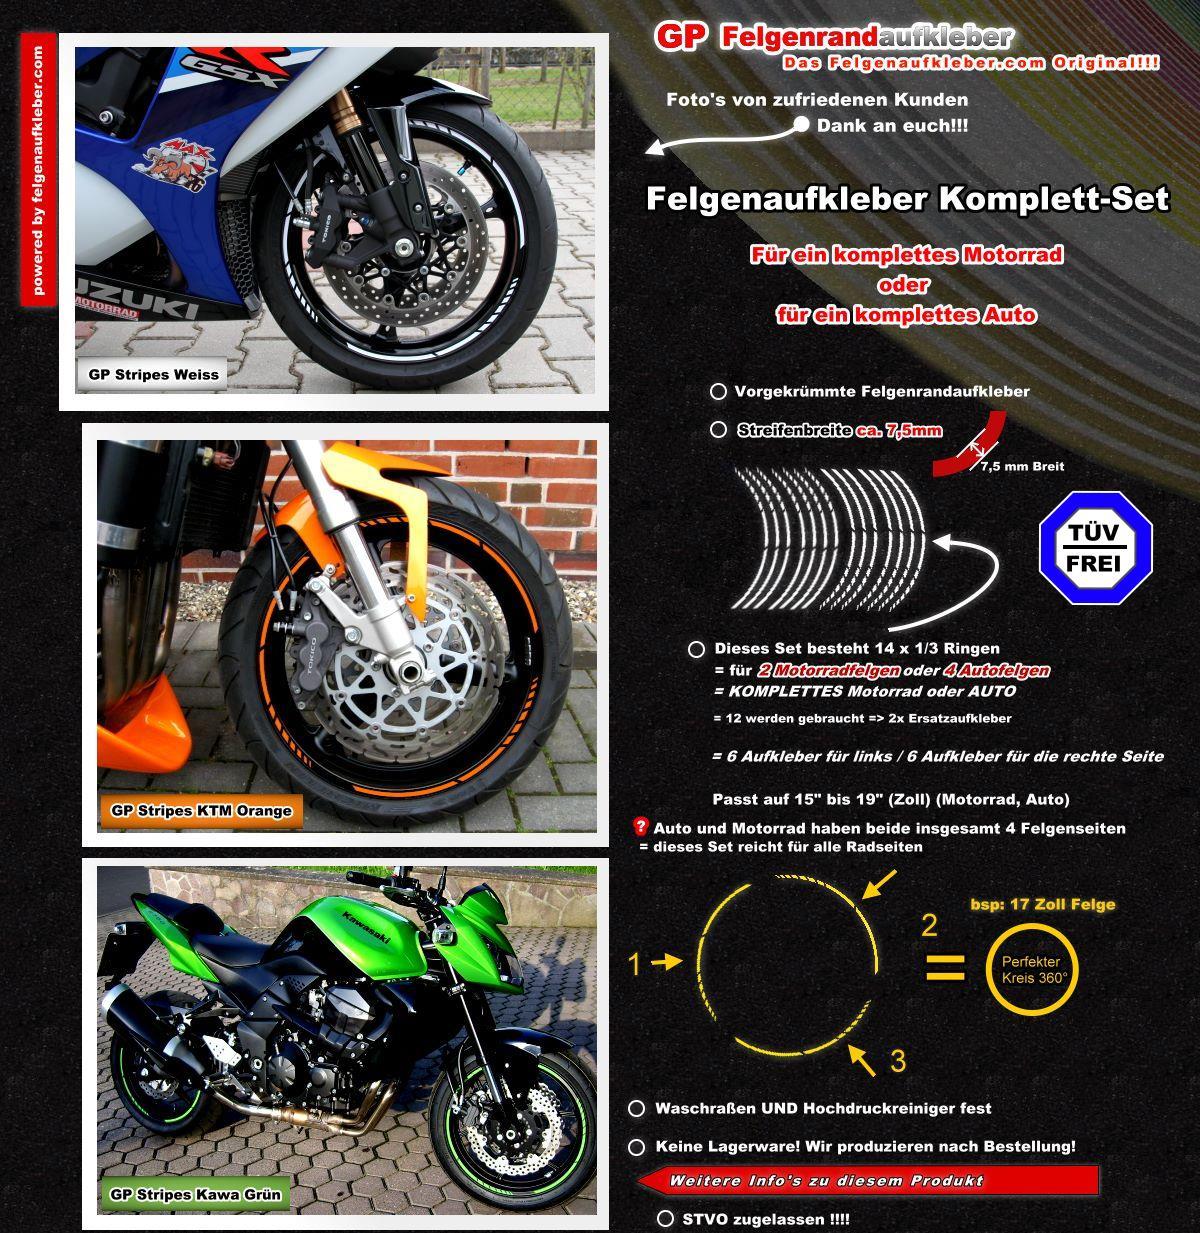 Moto GP Felgenrandaufkleber